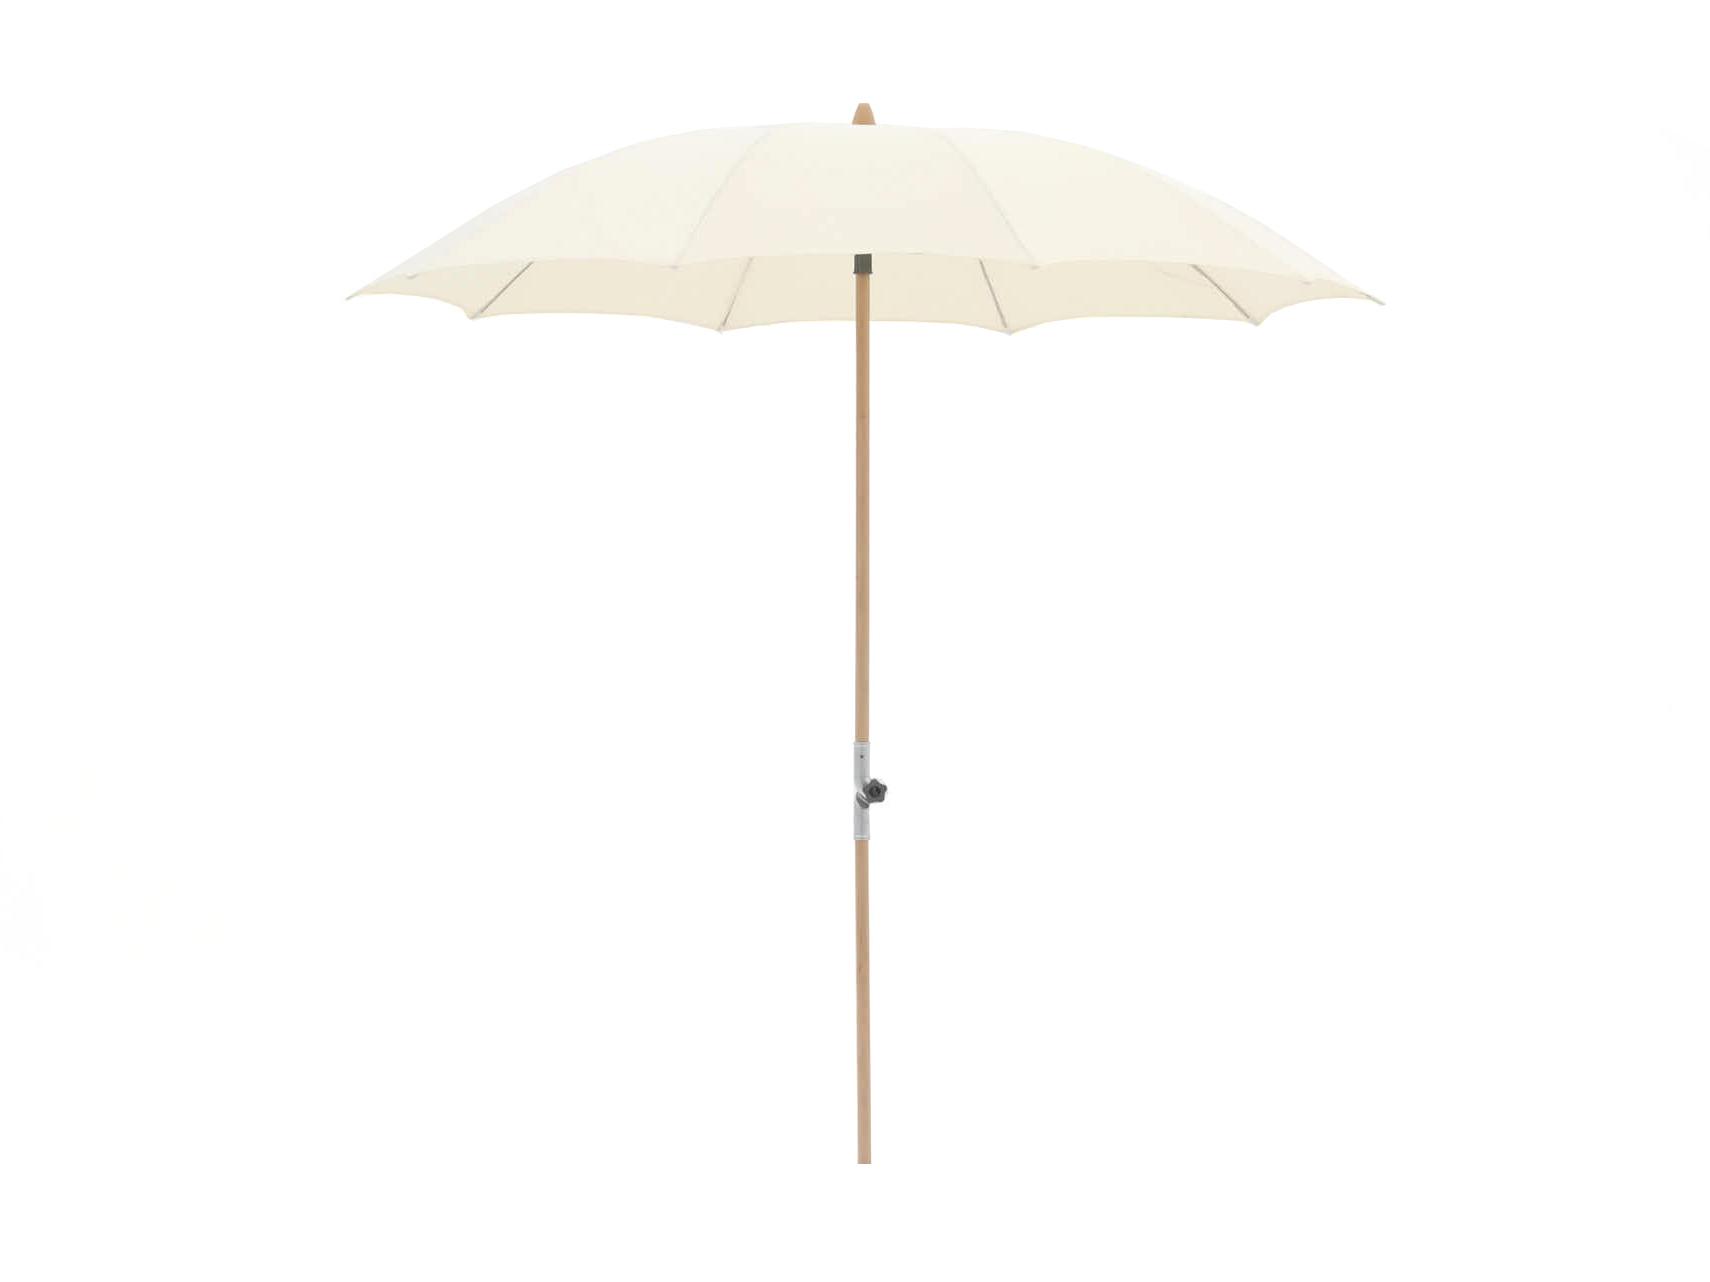 Suncomfort by Glatz Rustico parasol ø 220cm - Laagste prijsgarantie!